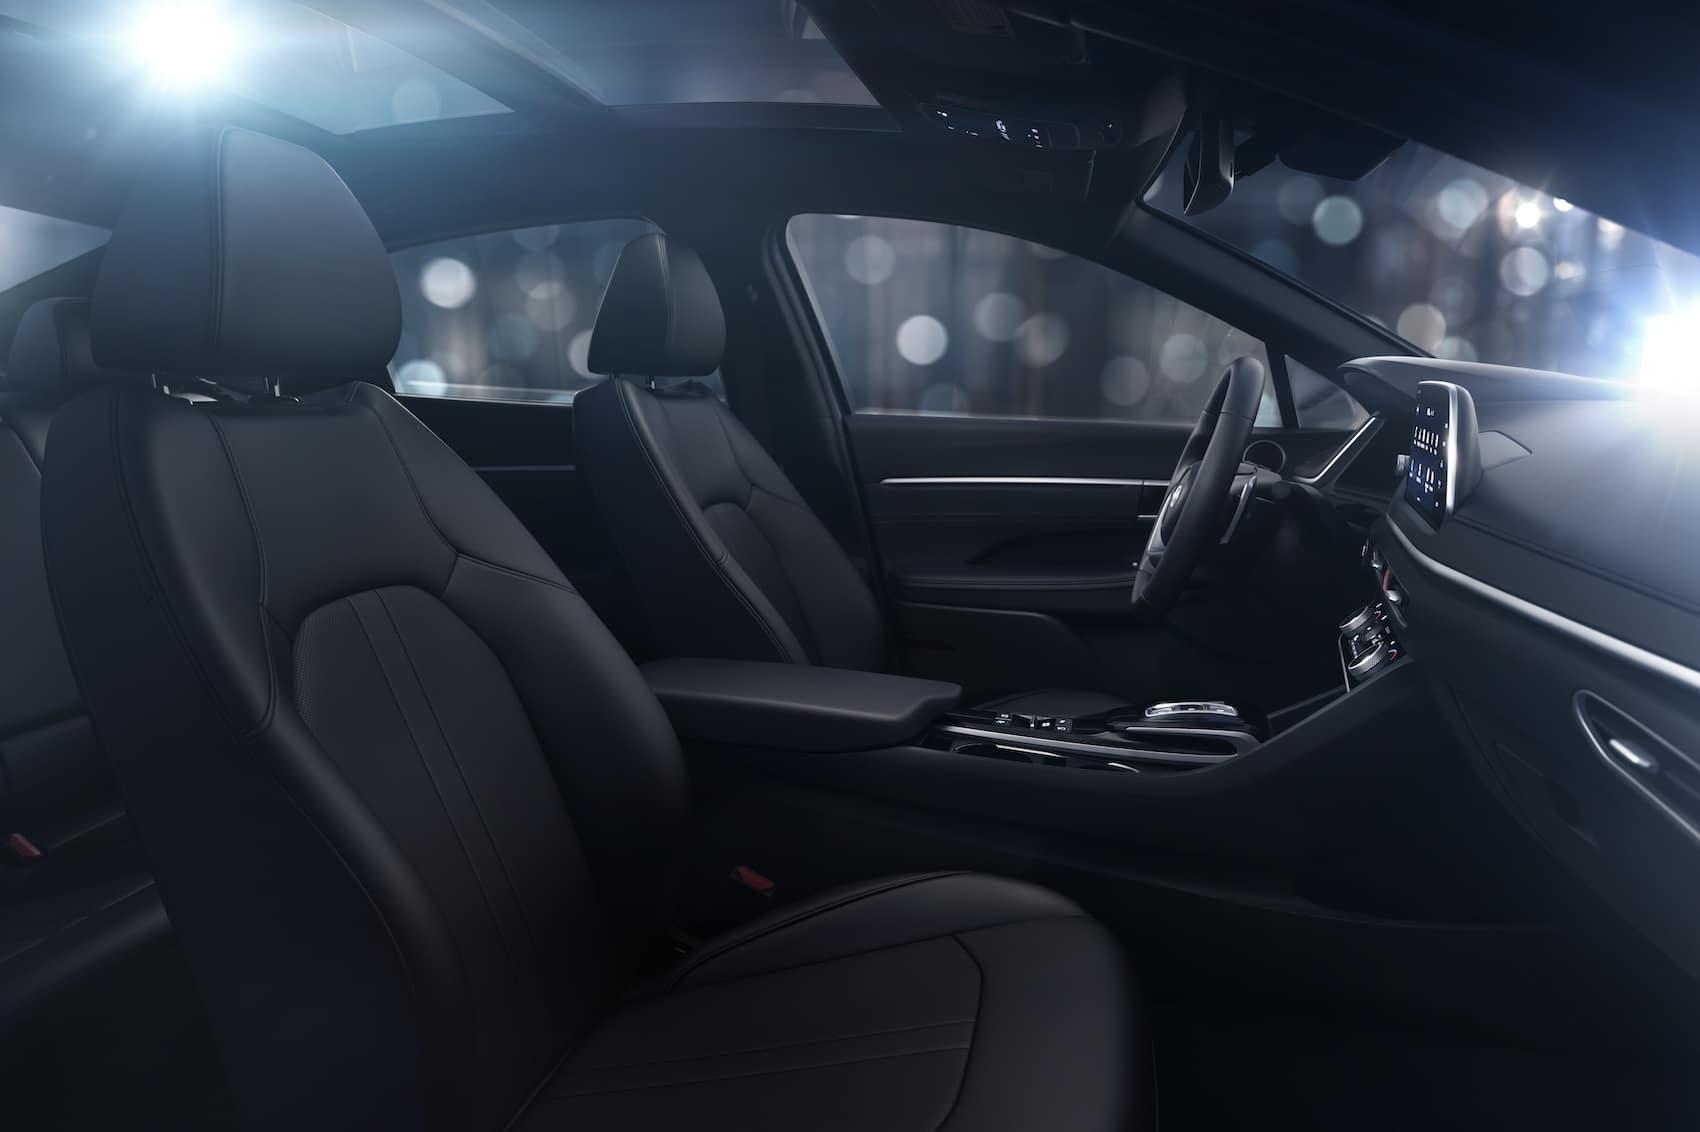 2021 Hyundai Sonata: Interior Space